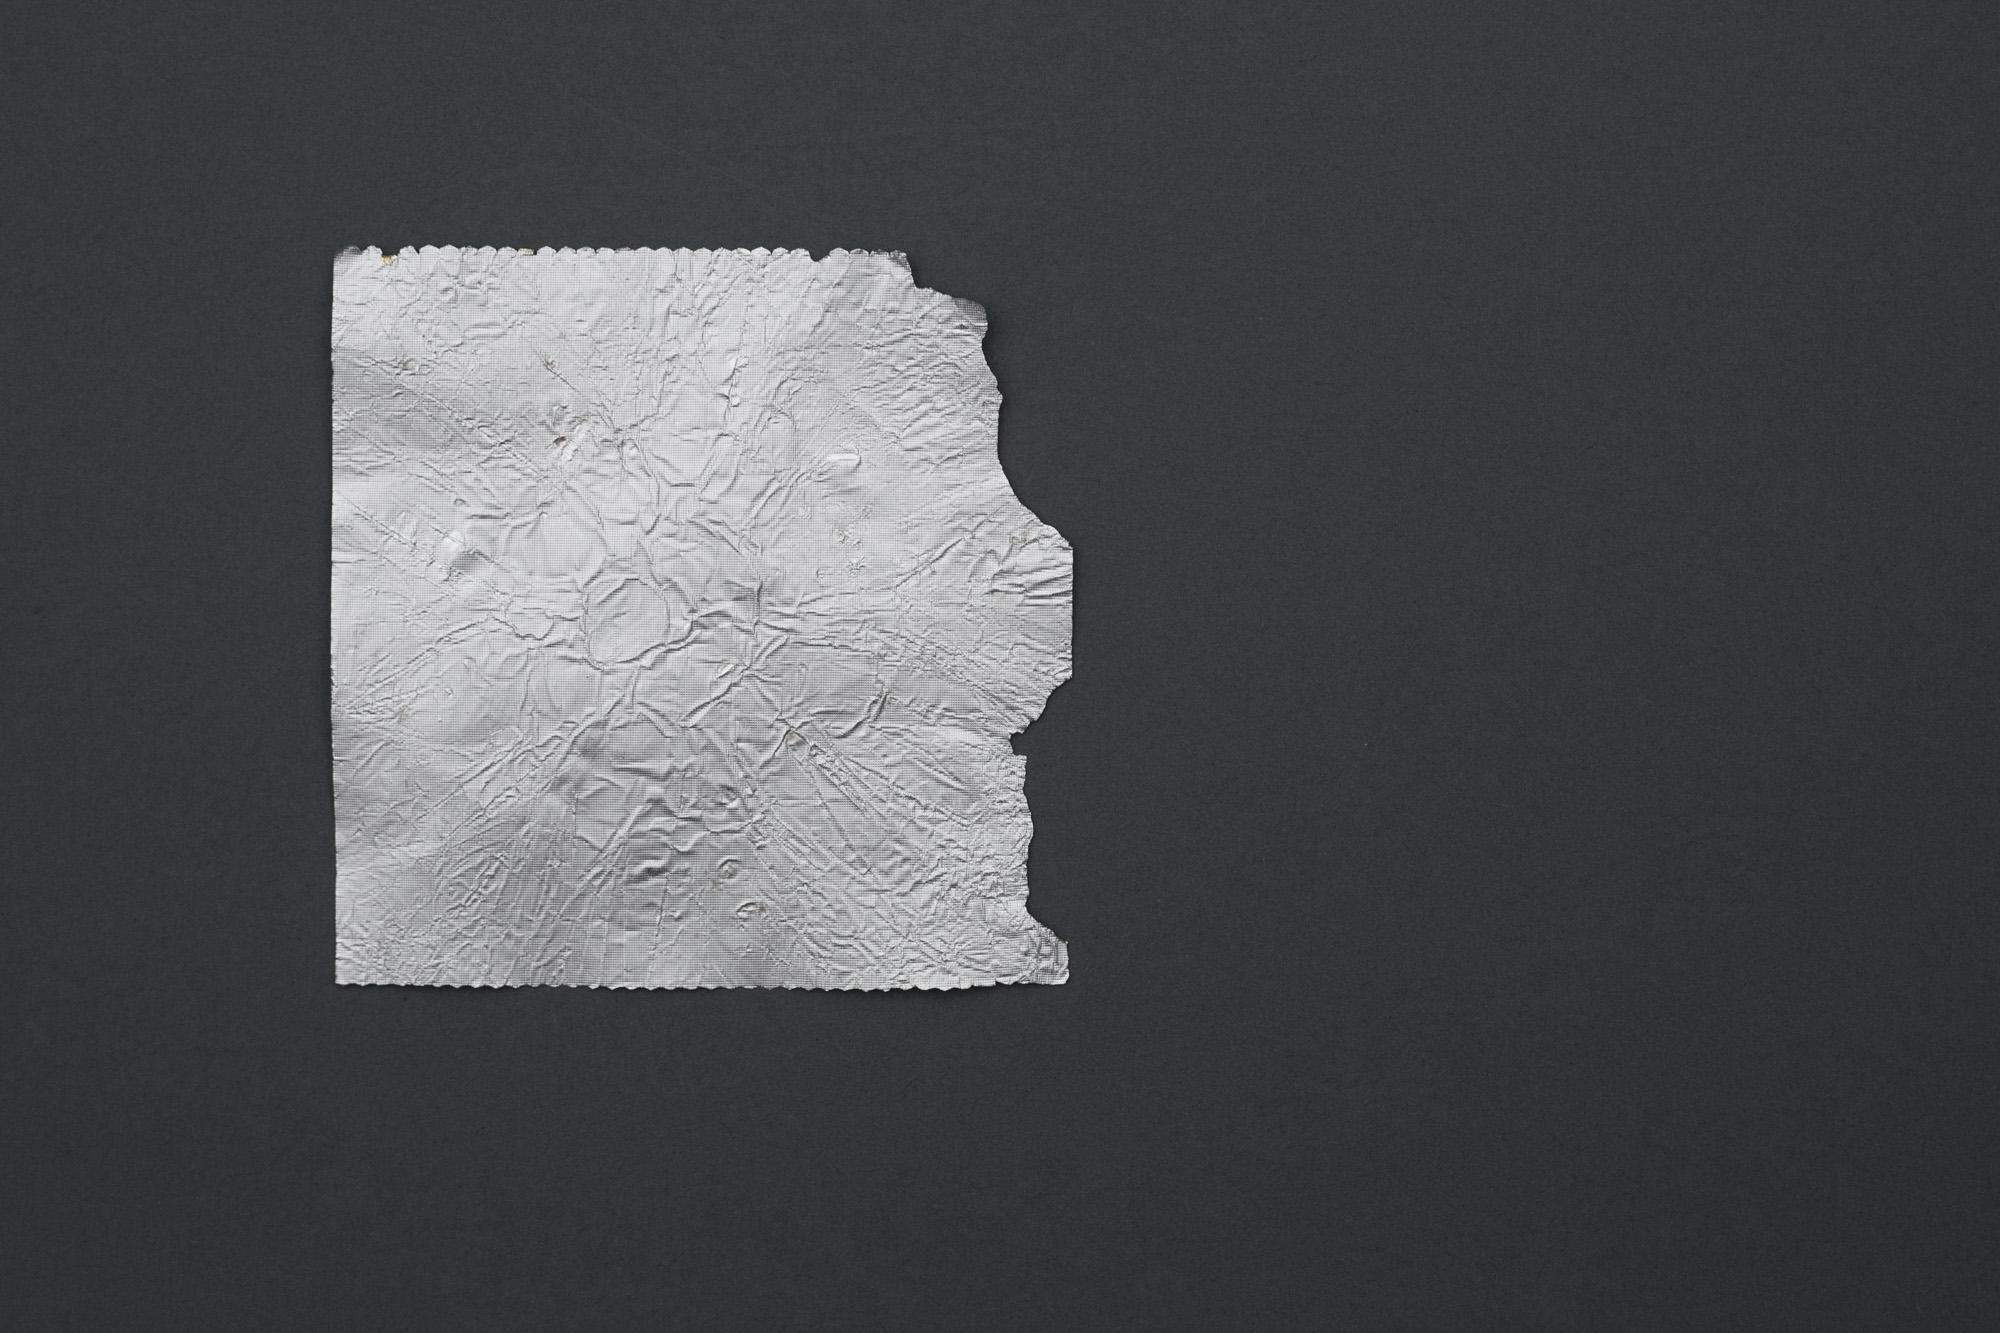 Unwrapped-20.jpg